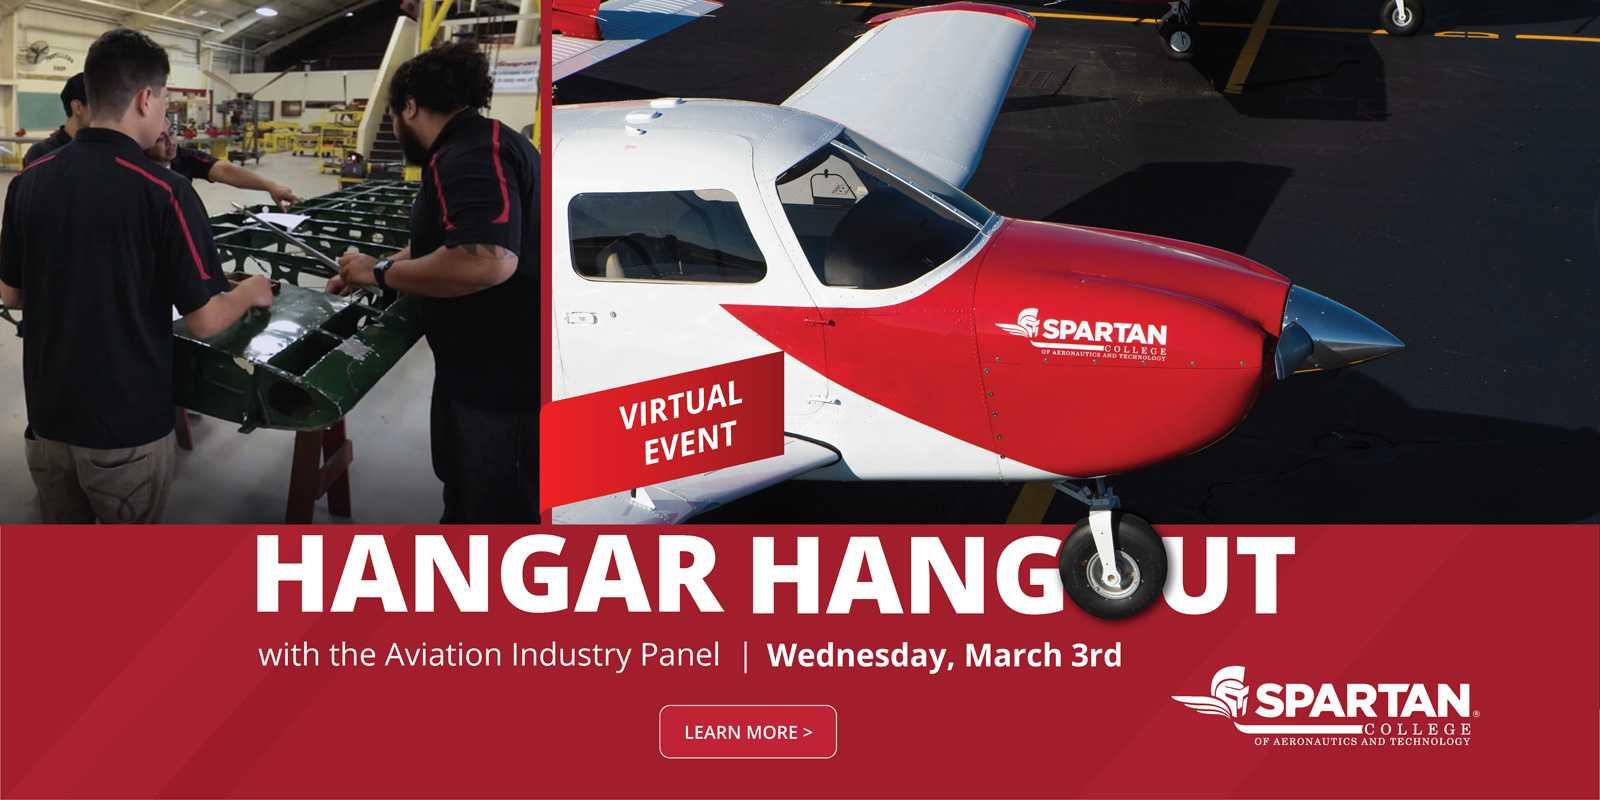 Hangout hangout event